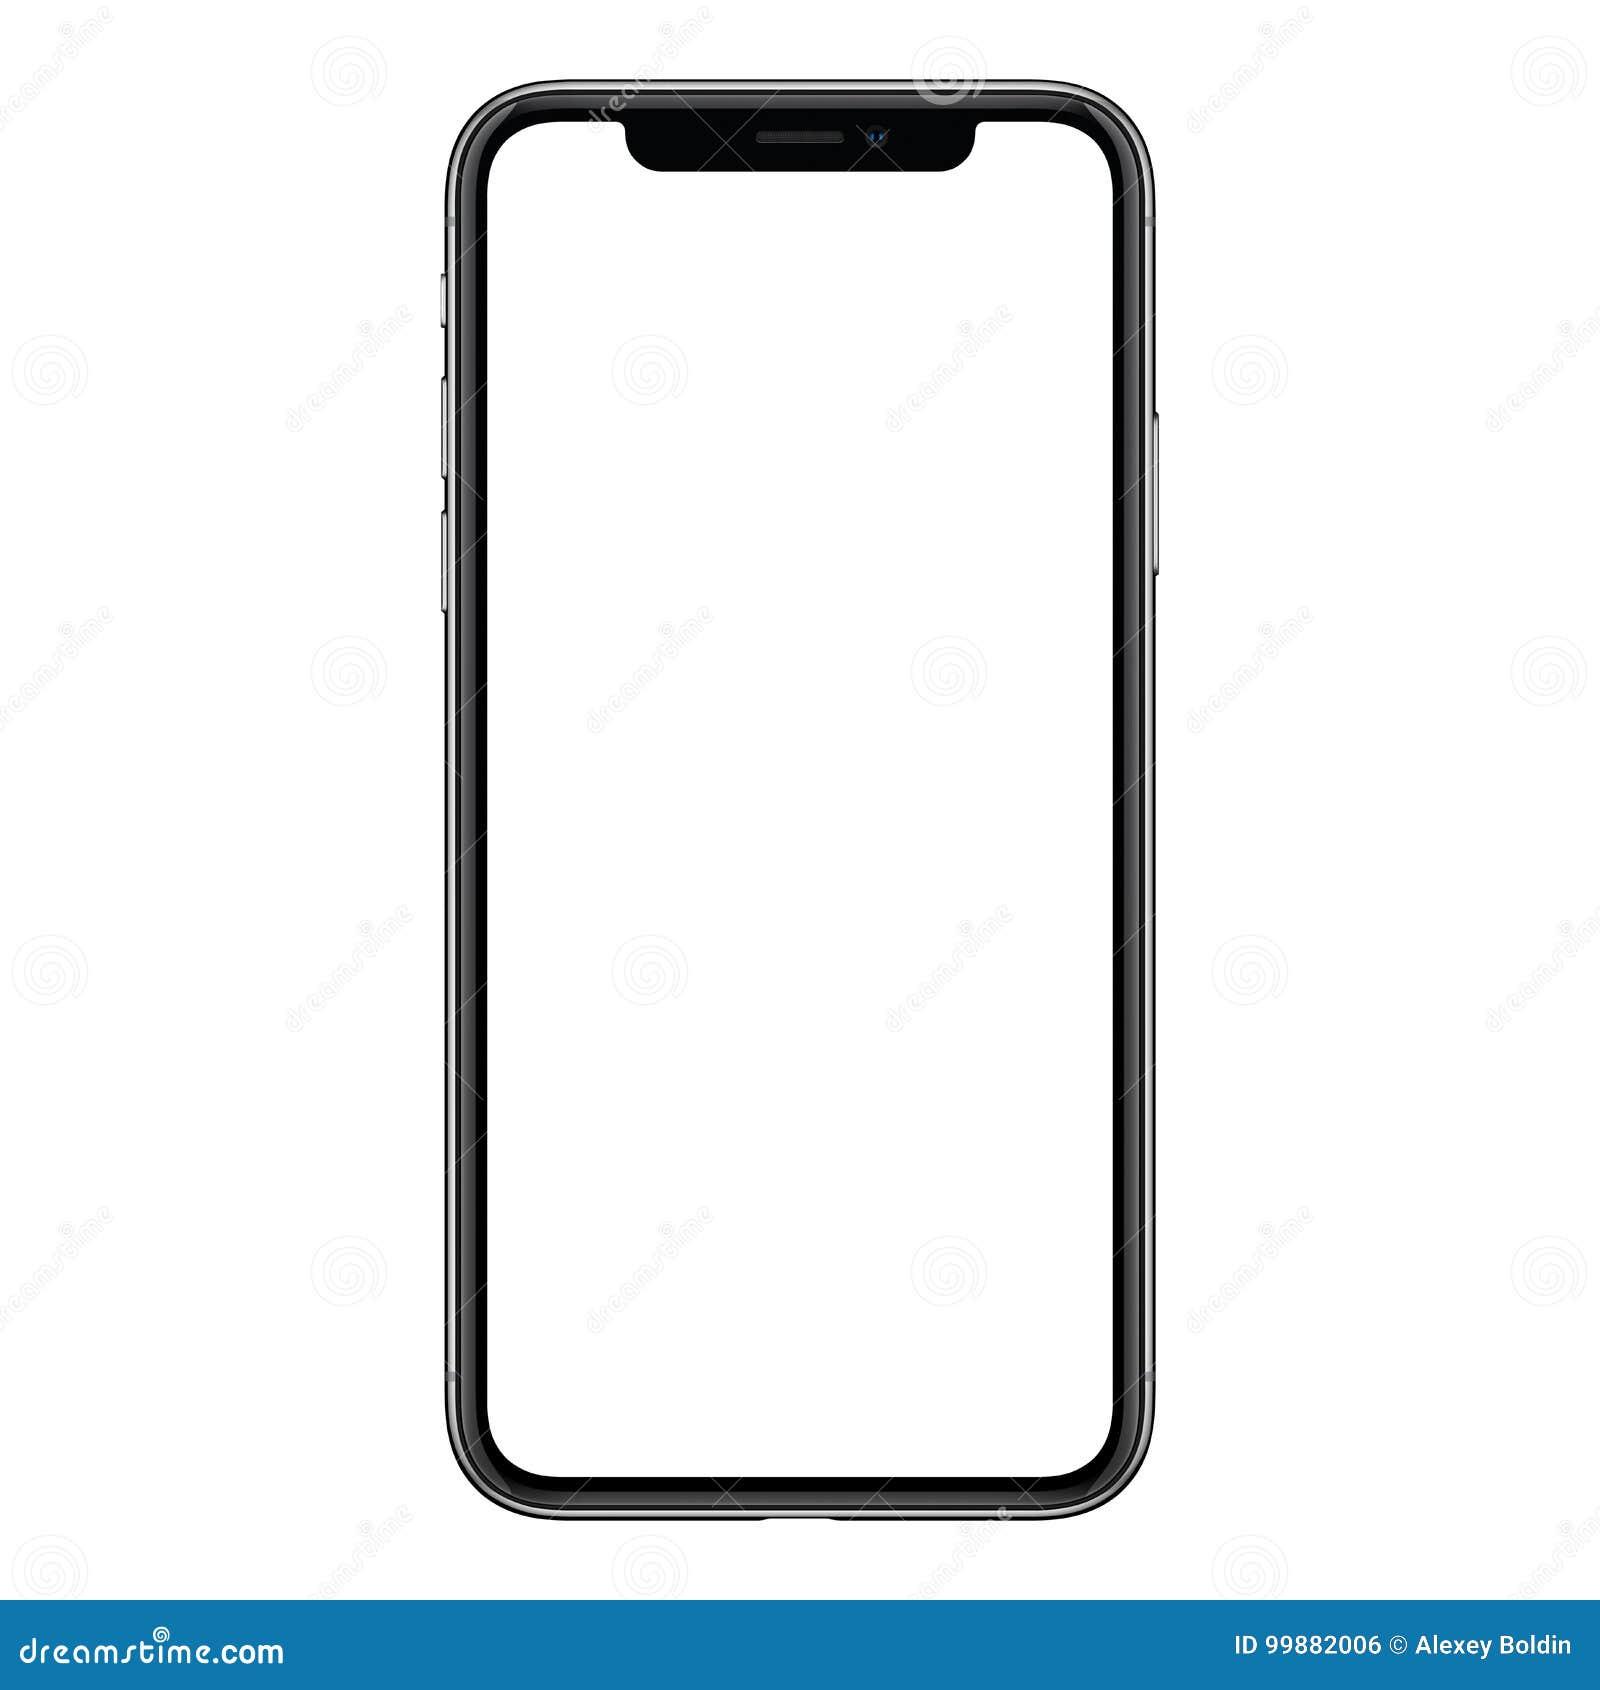 IPhone X. New Modern Frameless Smartphone Mockup With White Screen ...